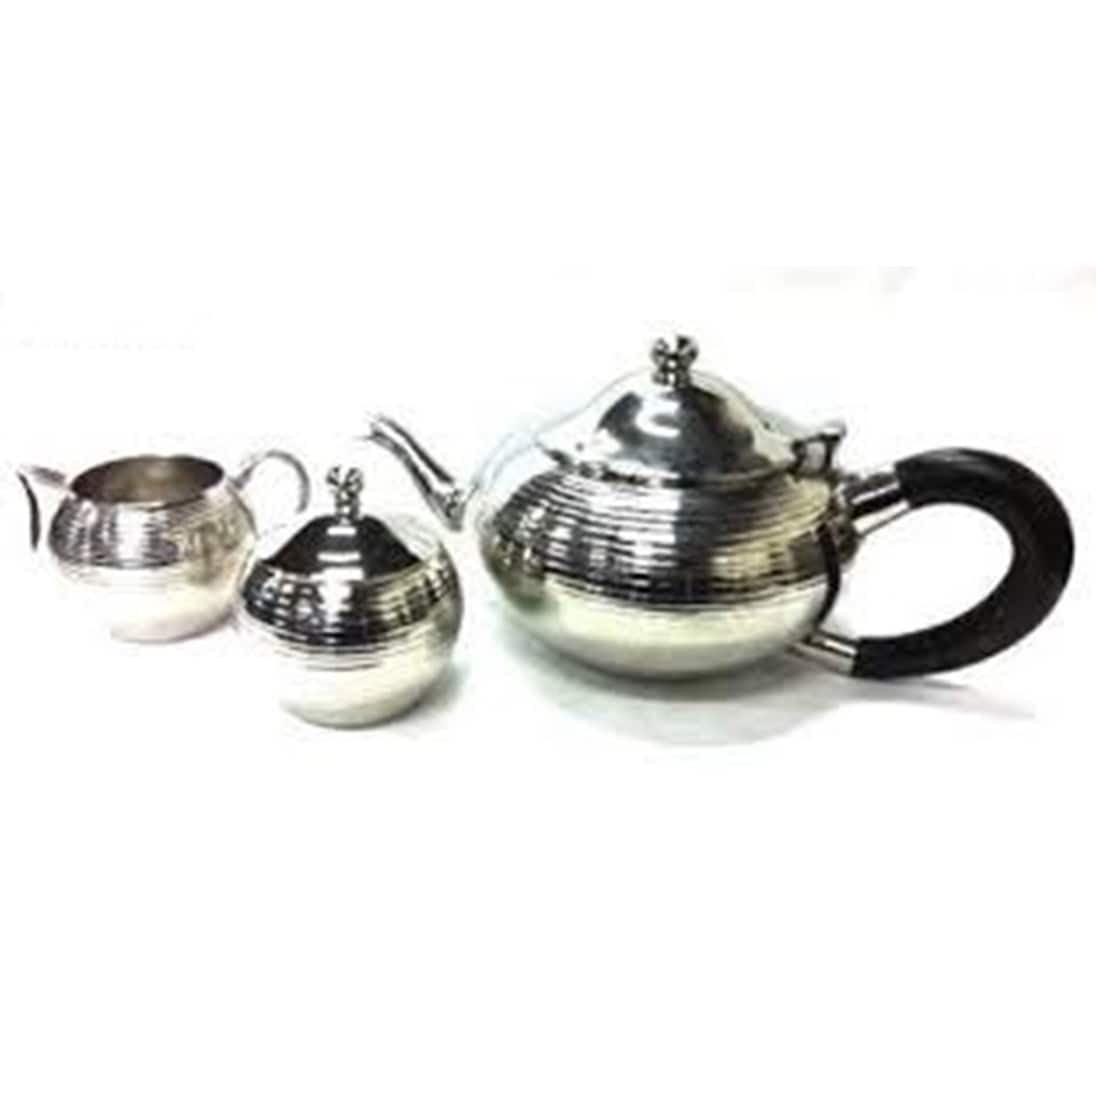 Elegance  Nickel Plated 3-pc Tea Set, Non Tarnish